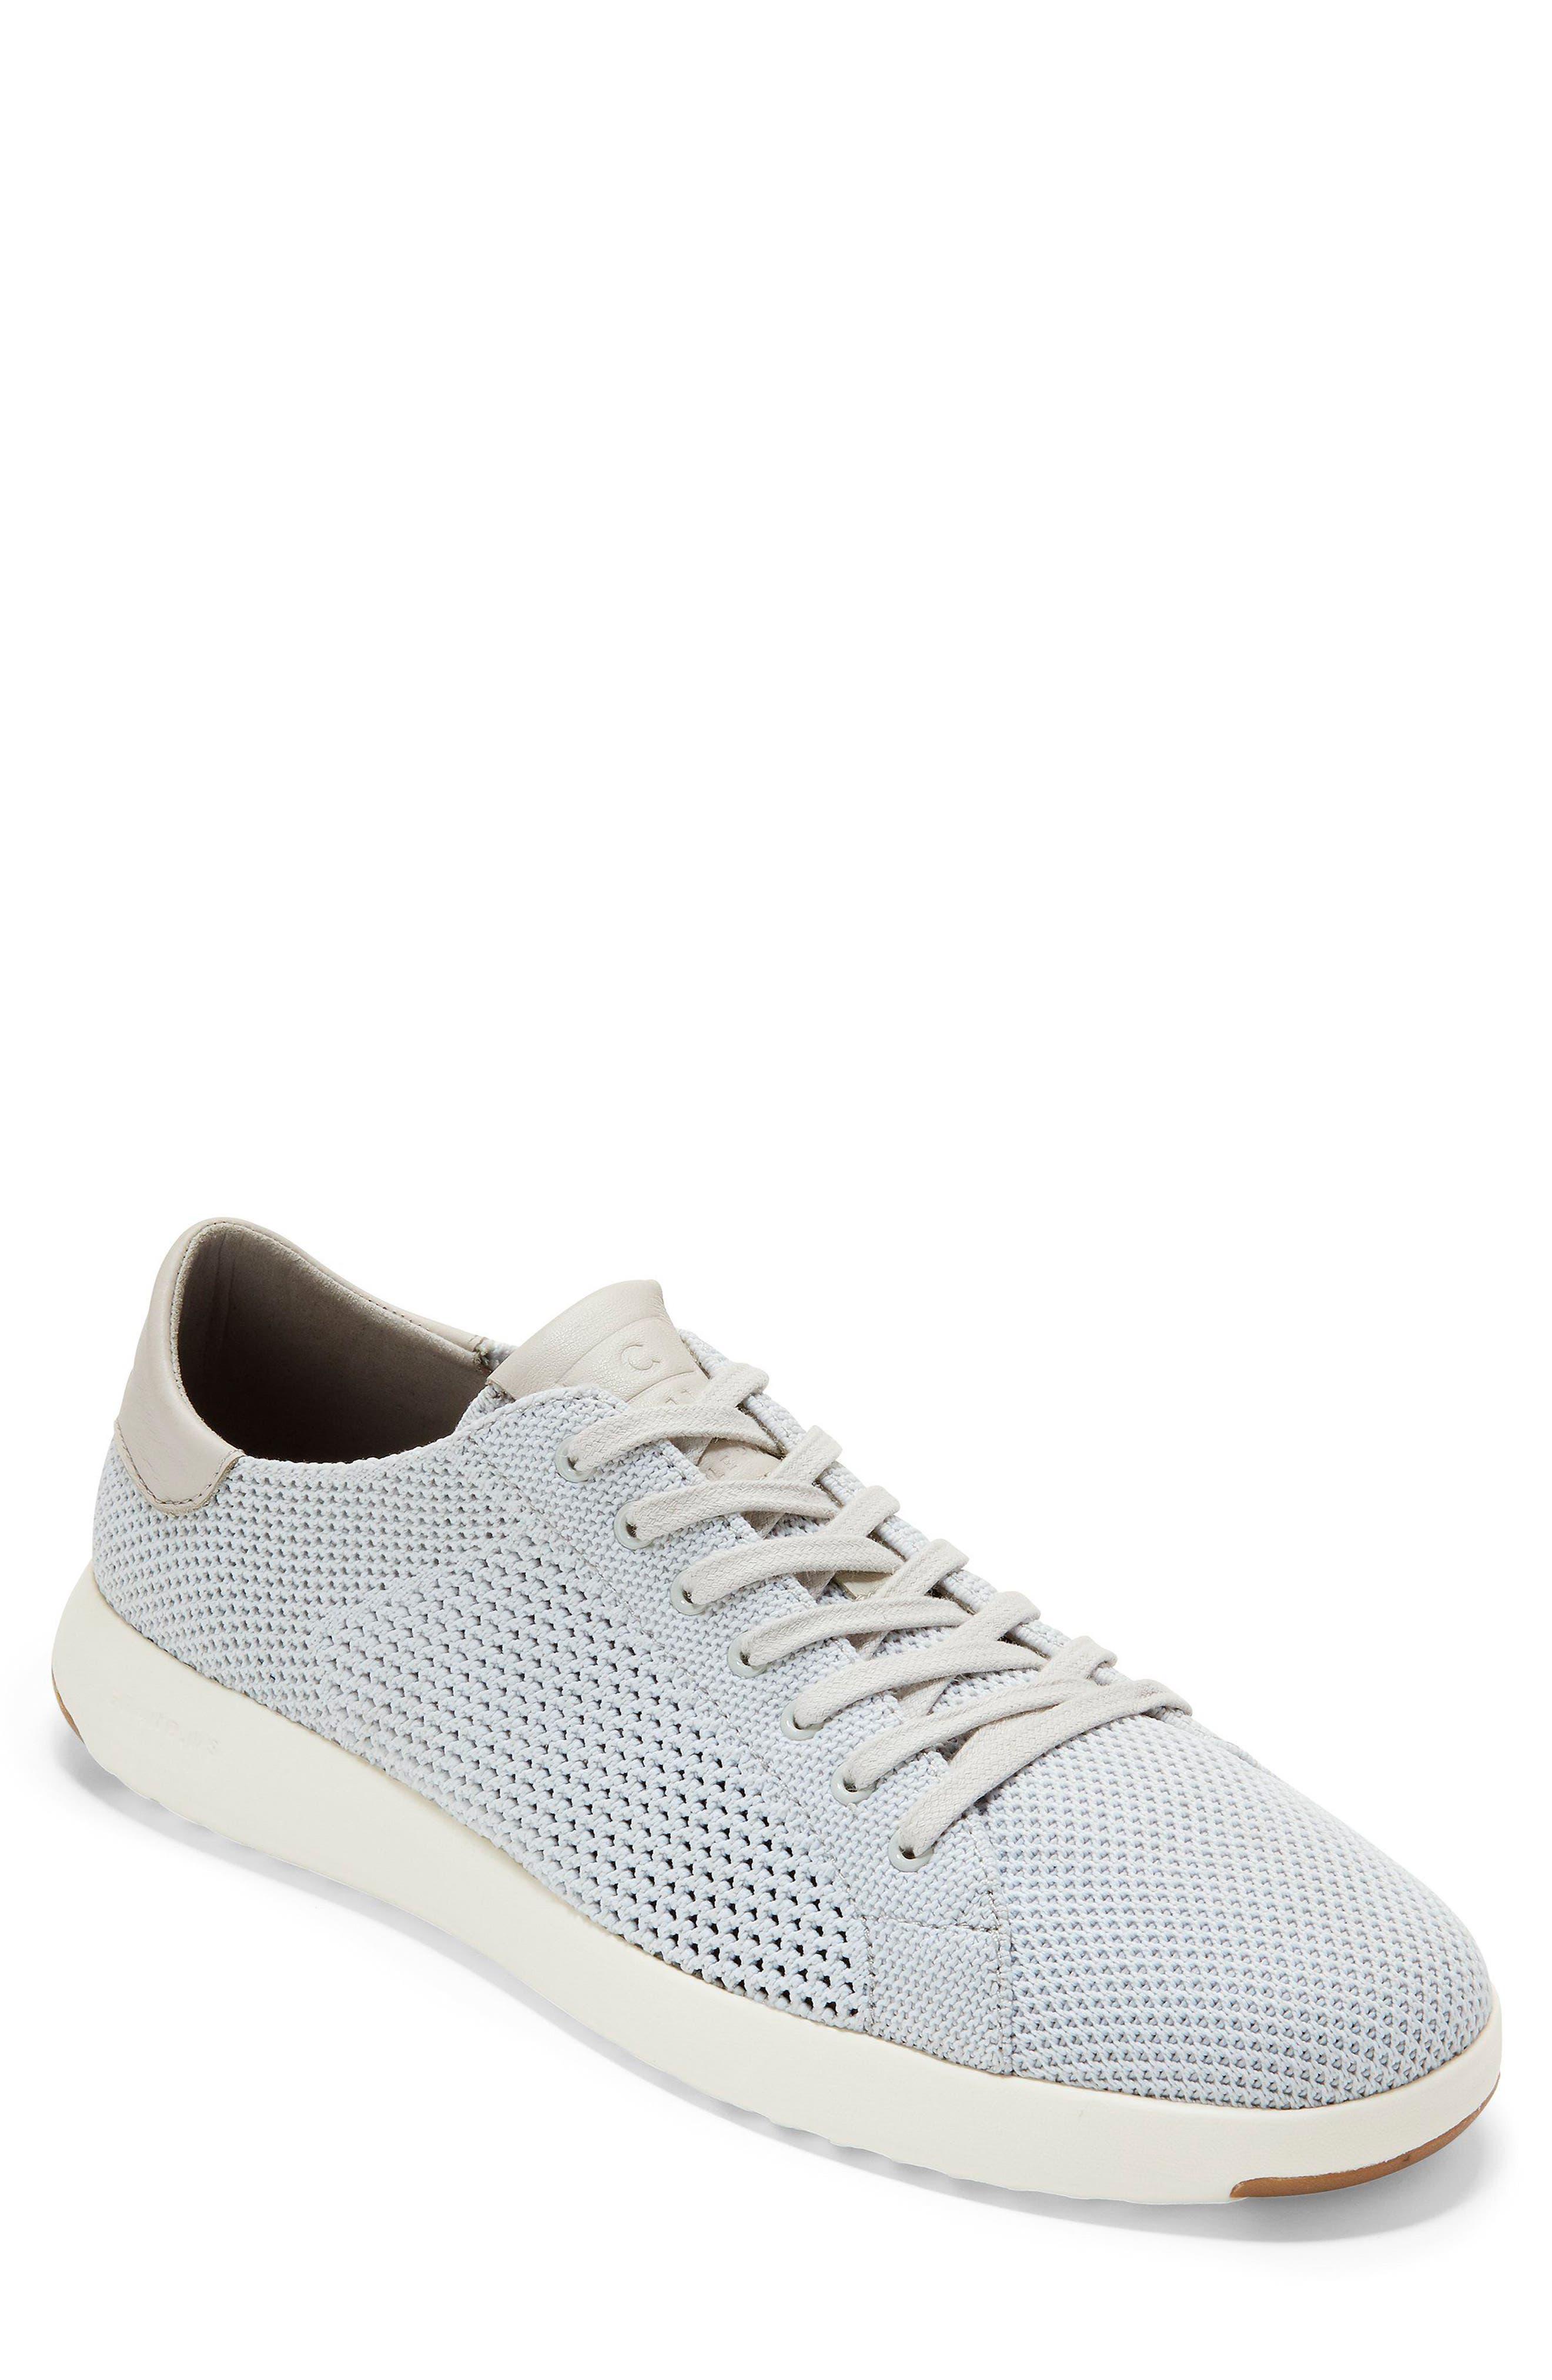 GrandPro Tennis Stitchlite Sneaker,                             Main thumbnail 3, color,